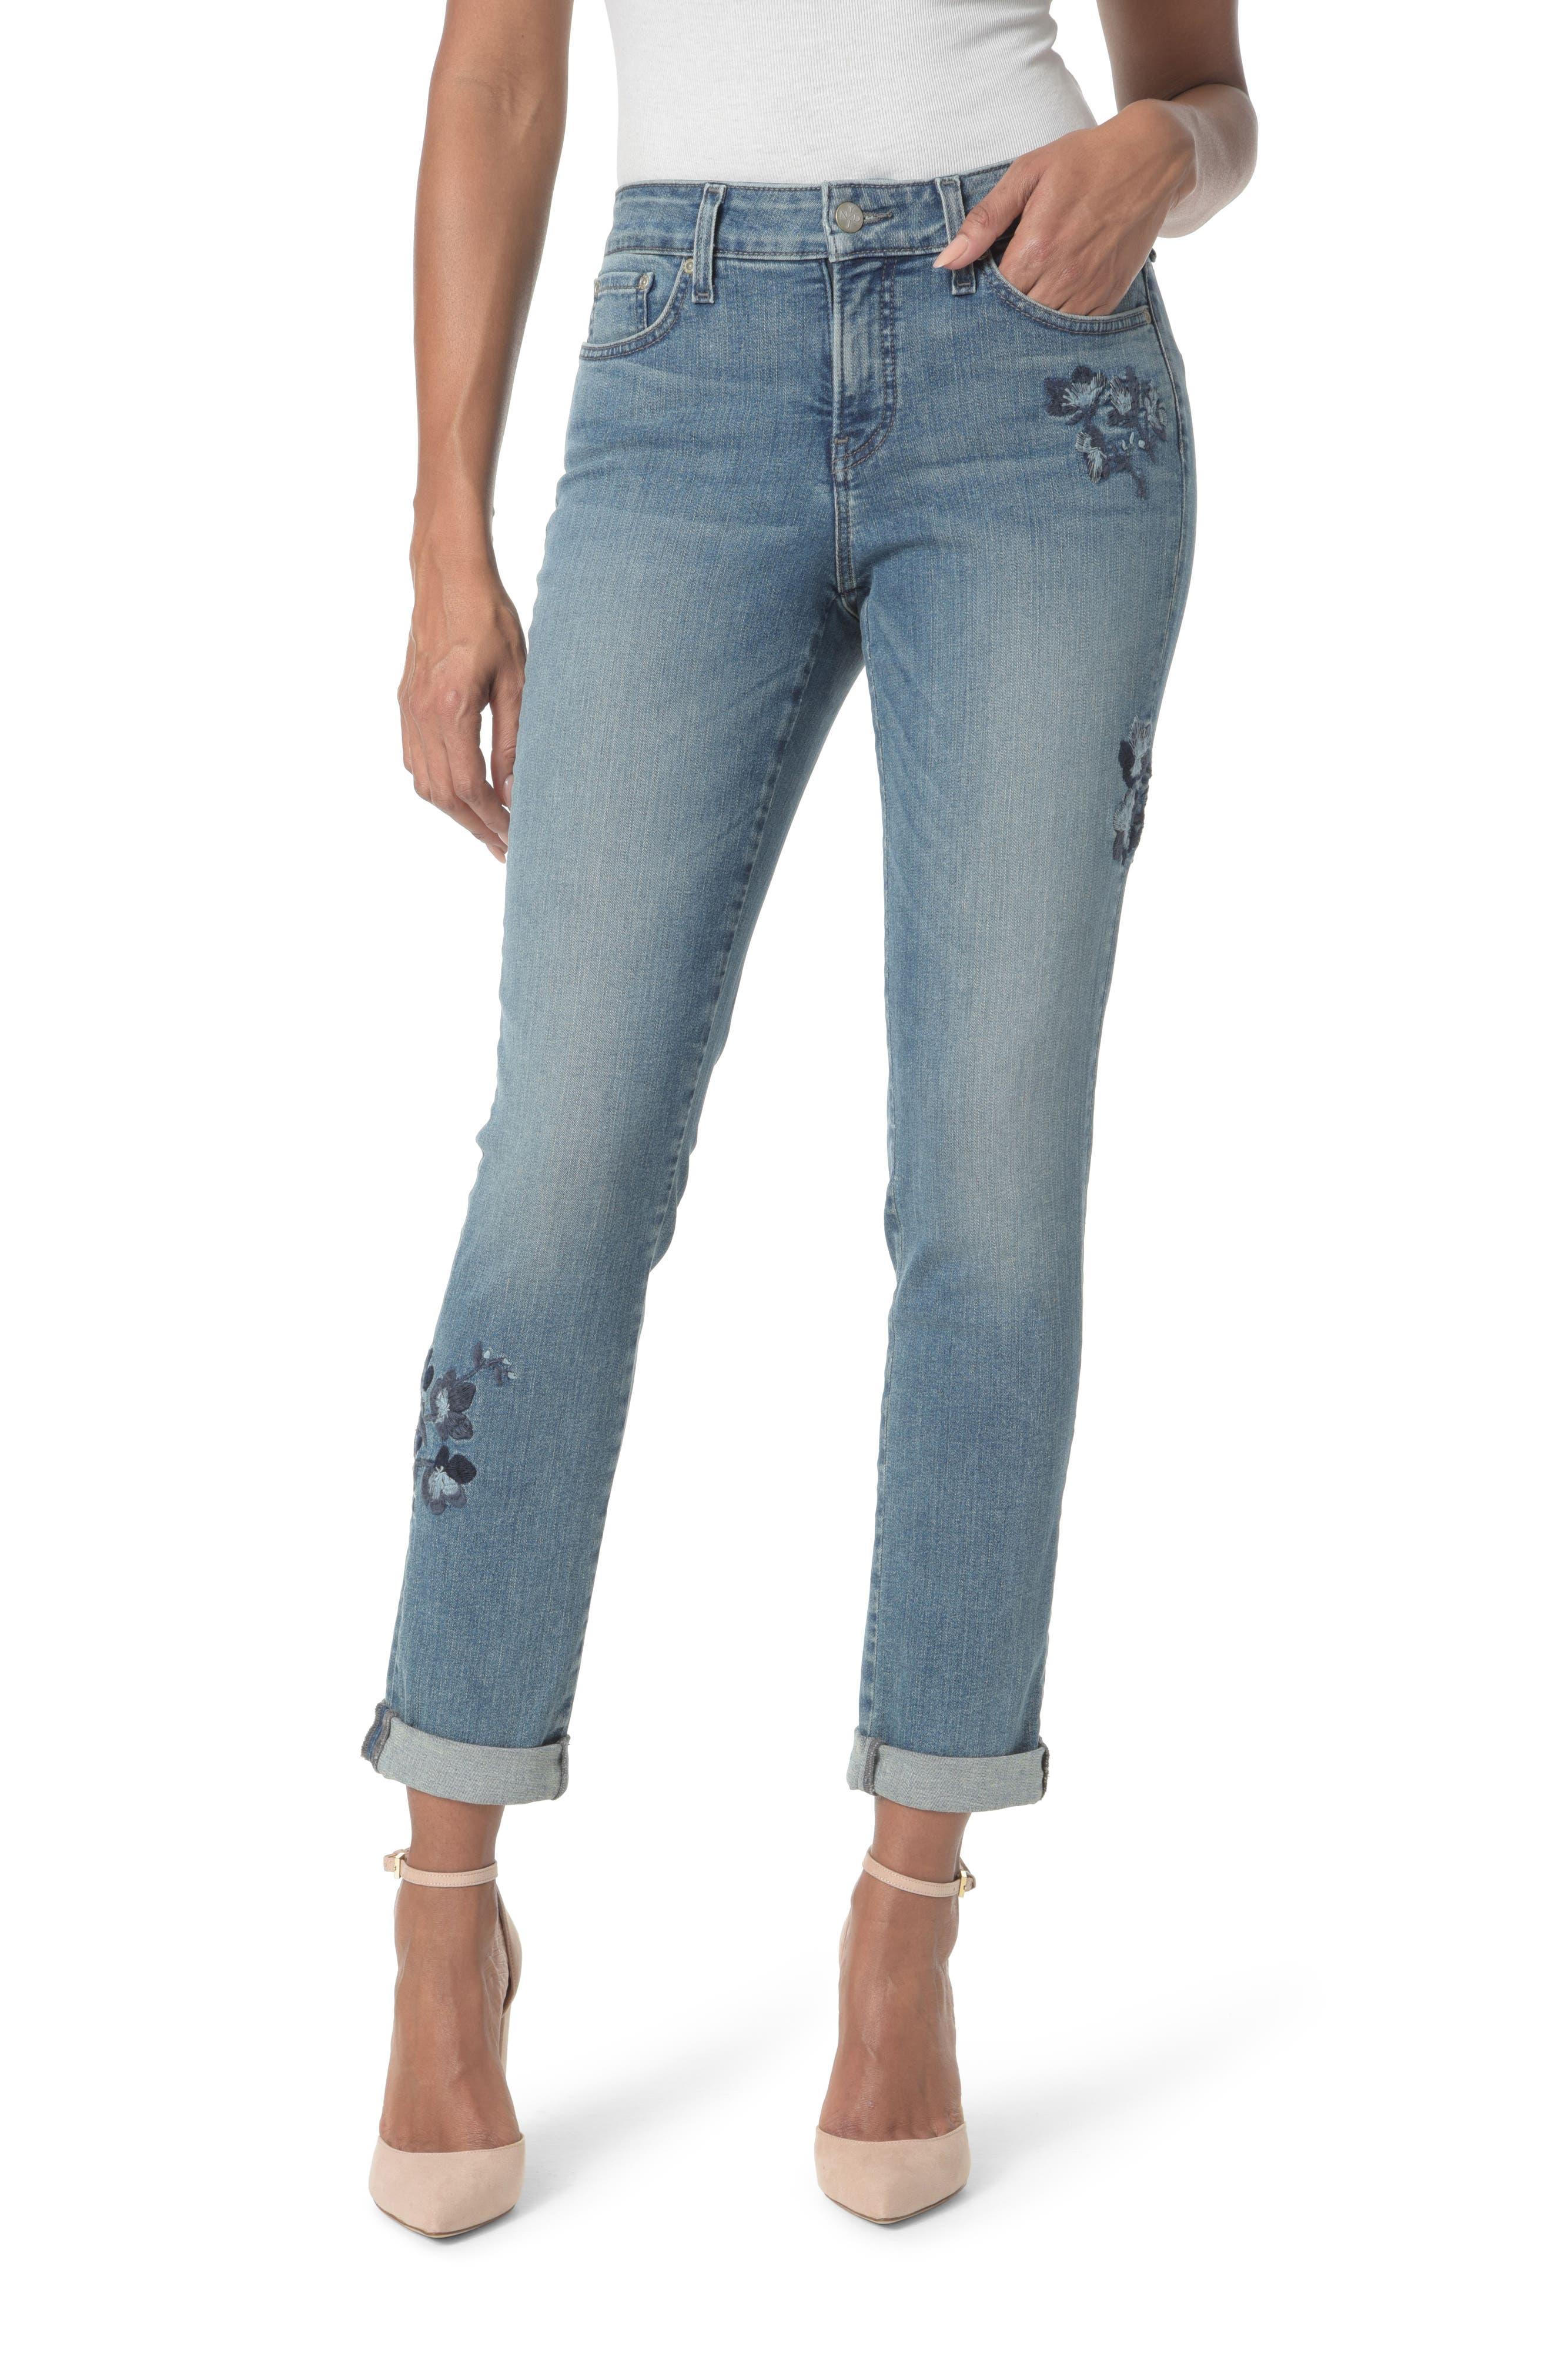 NYDJ Embroidered Boyfriend Jeans (Pacific)